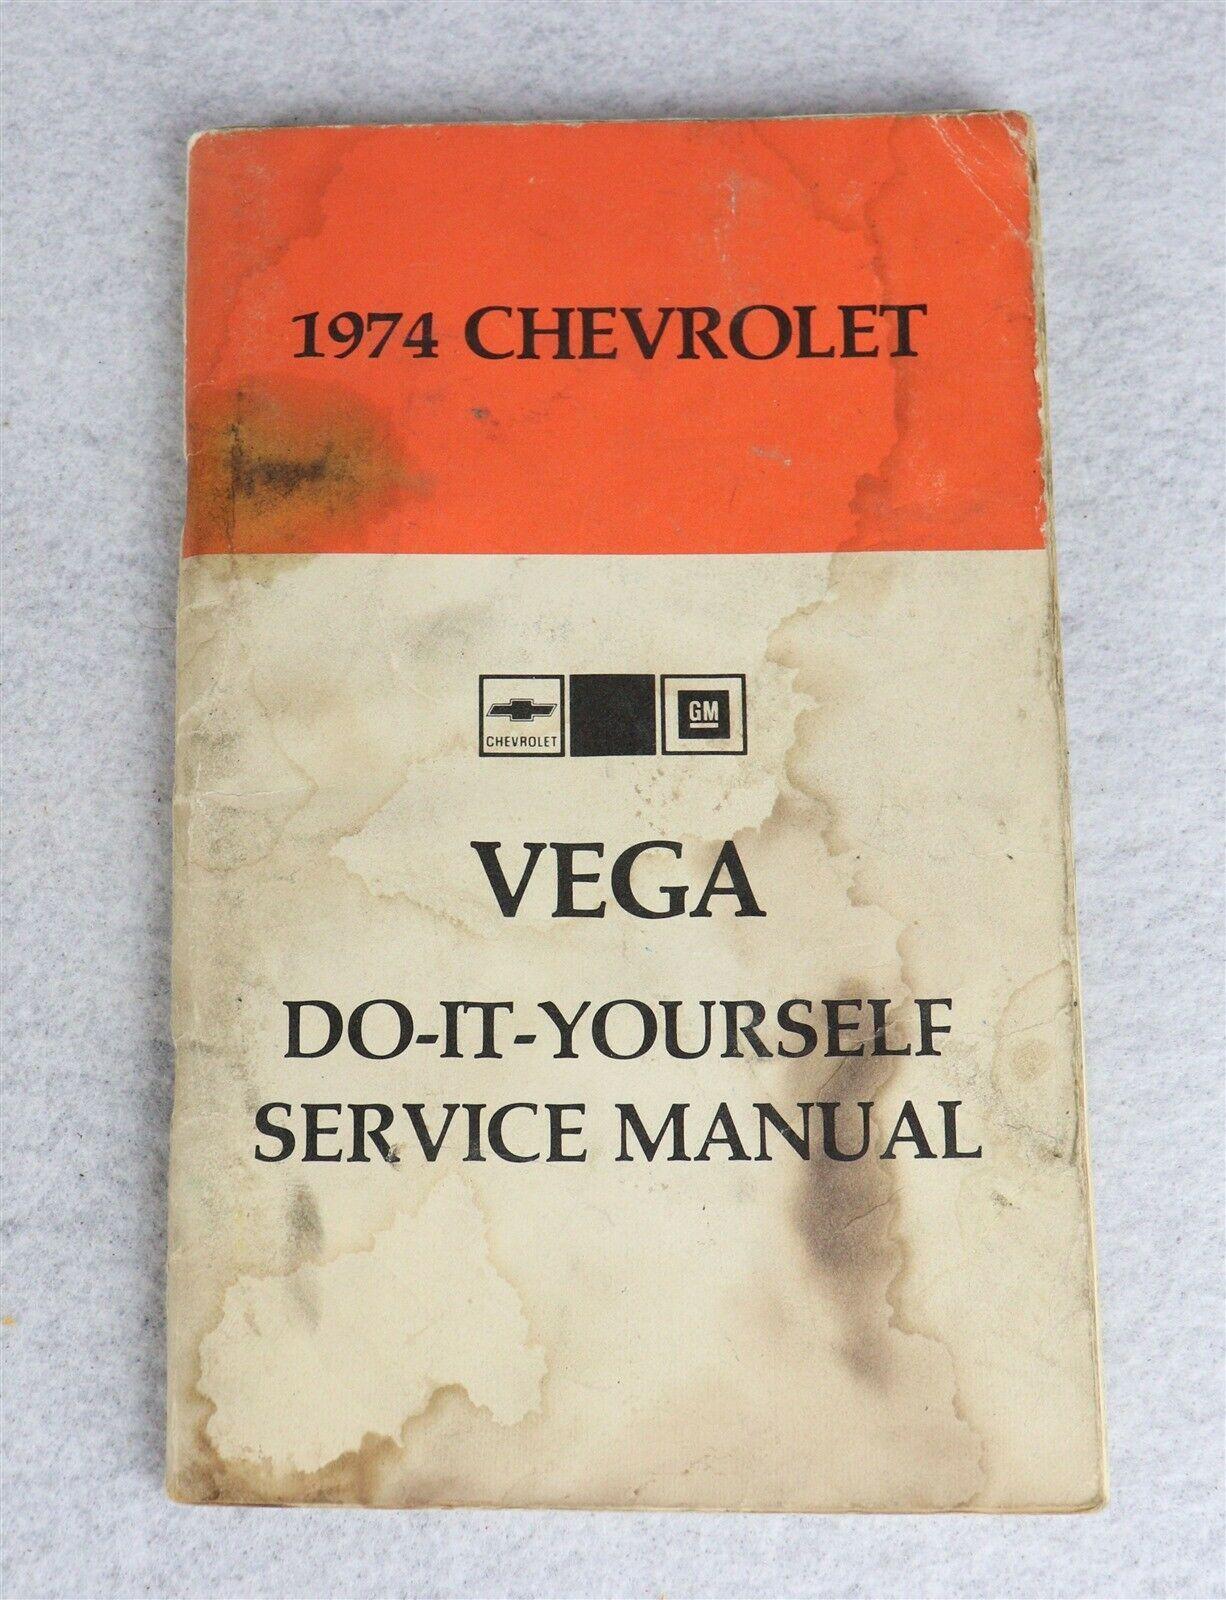 1974 Chevrolet Vega Do-It-Yourself Service Manual